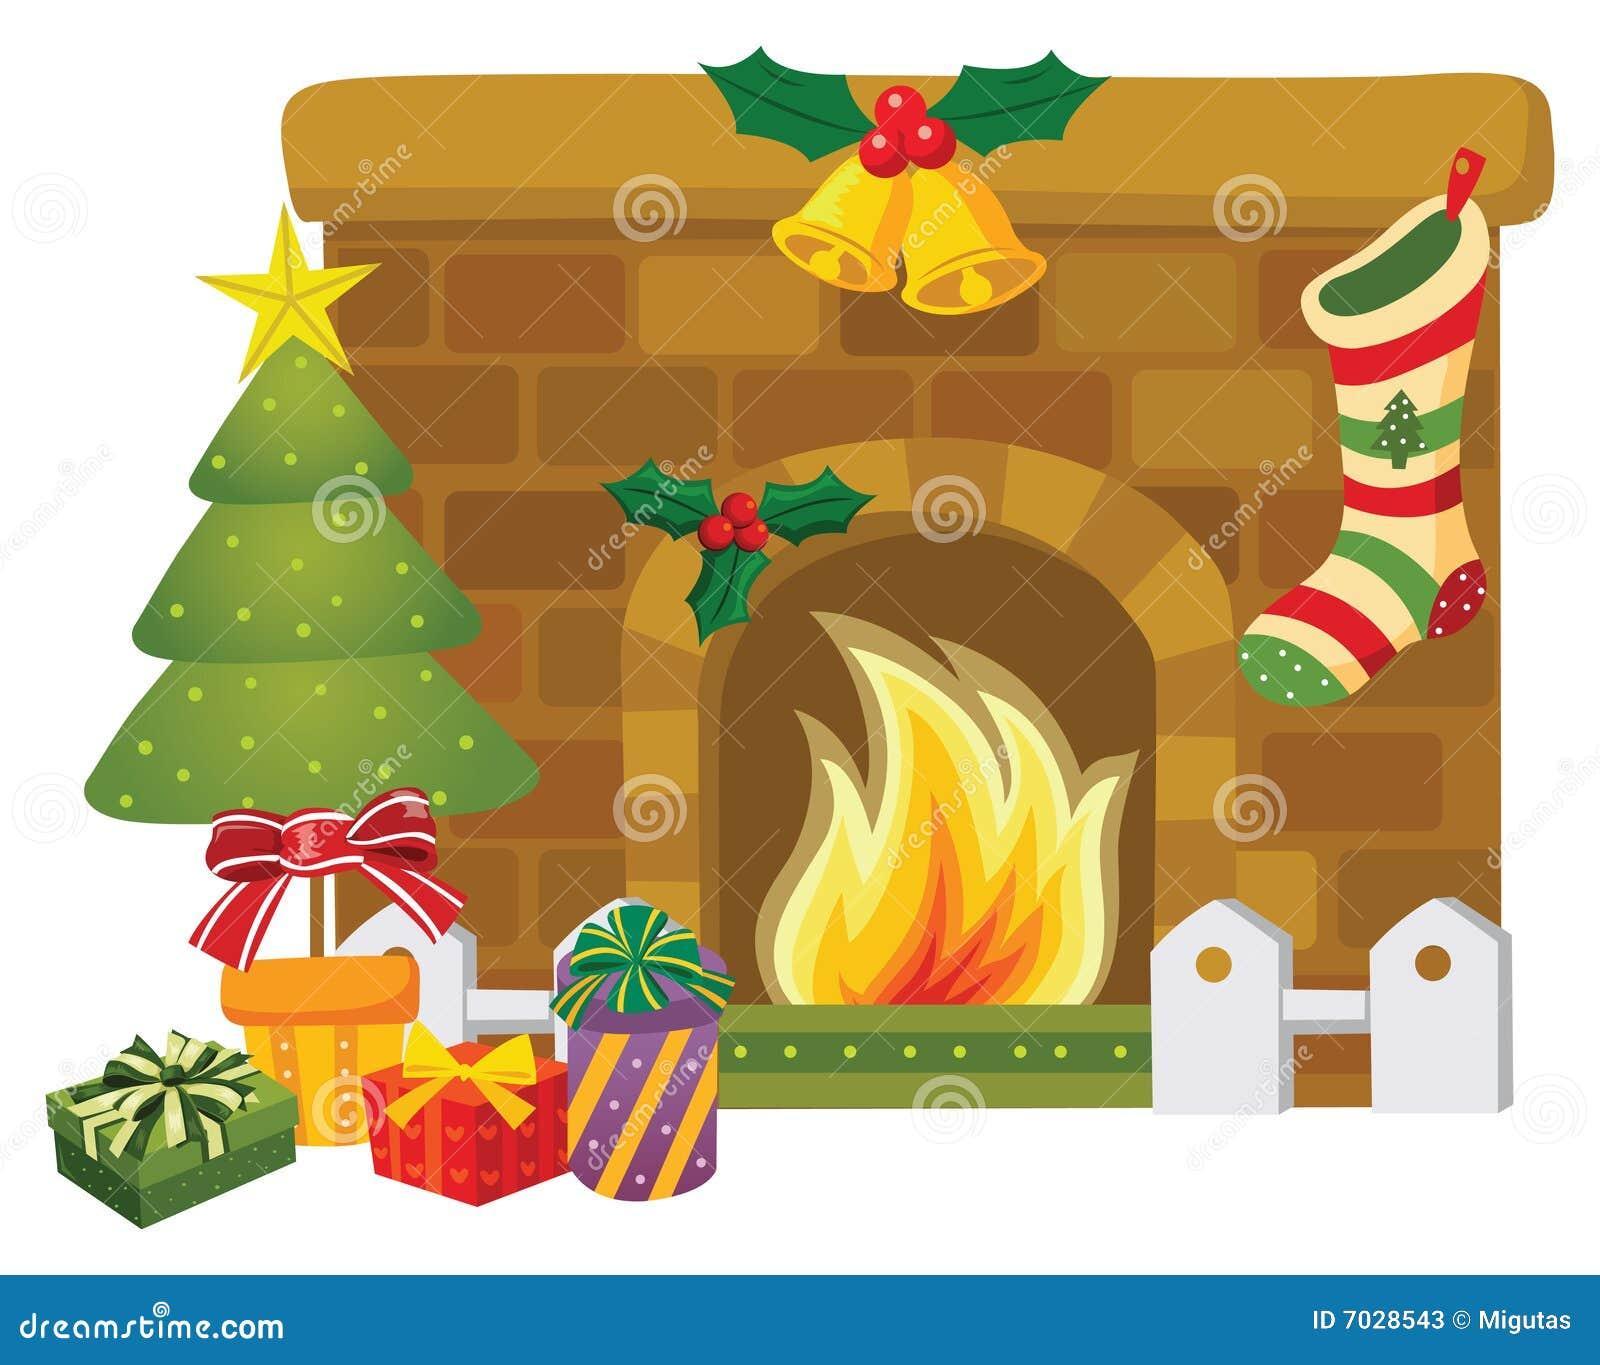 Christmas Fireplace Stock Photos - Image: 7028543